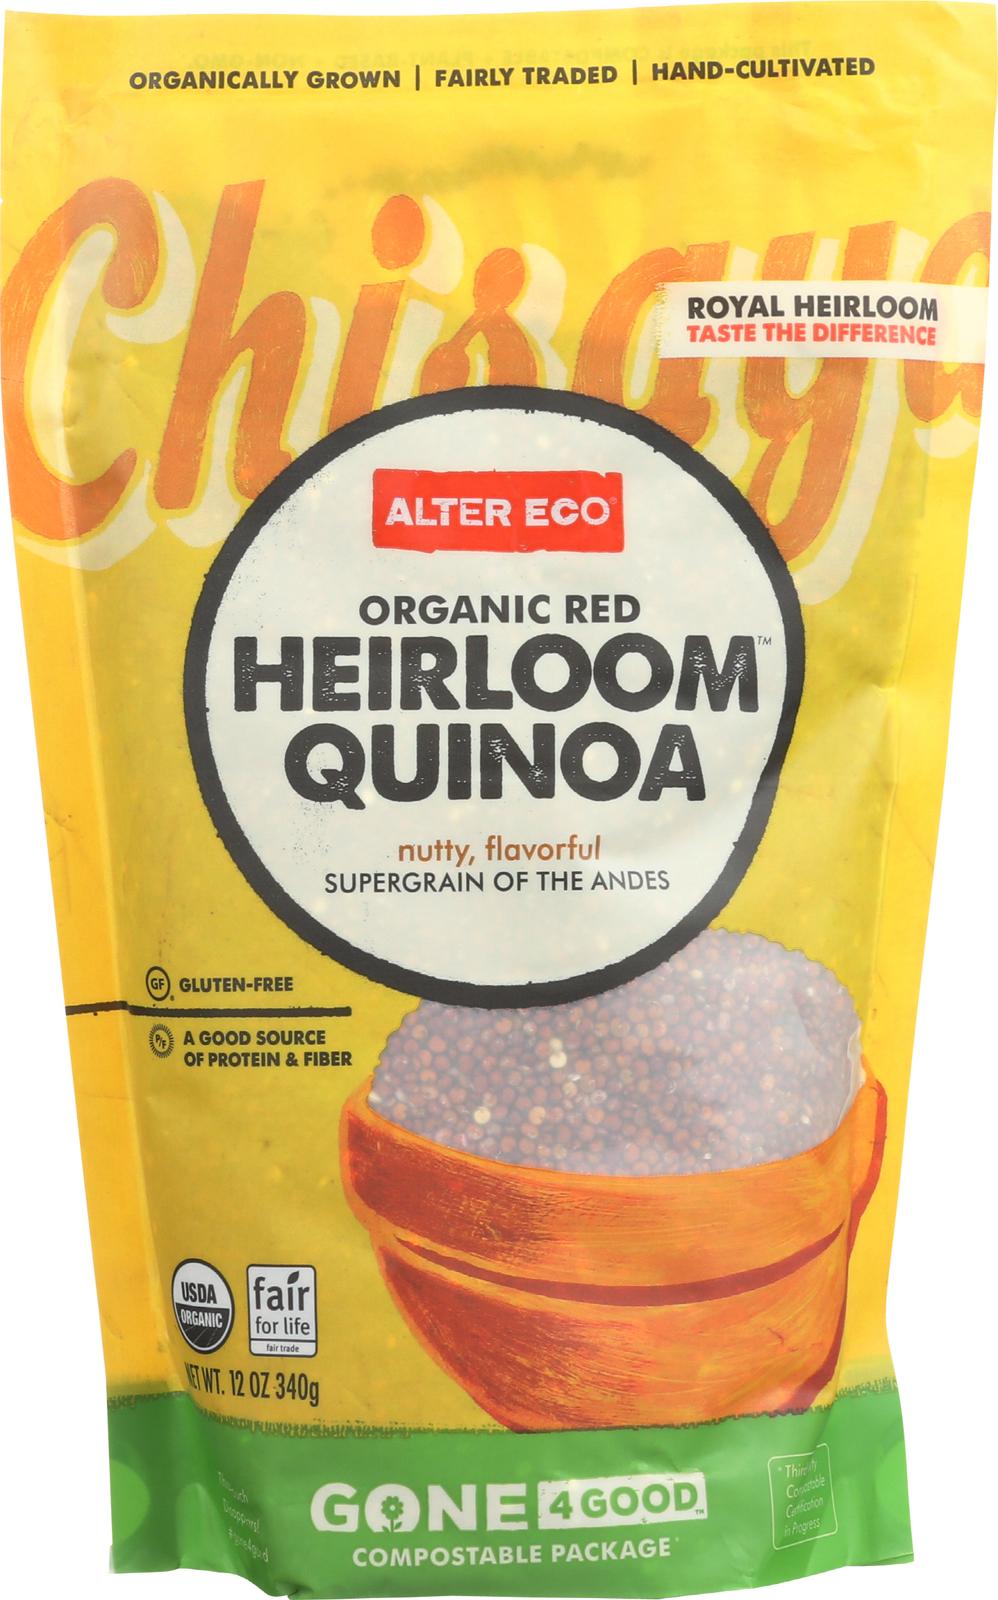 Alter Eco Americas Quinoa - Organic Red Heirloom - Case of 6 - 12 oz.